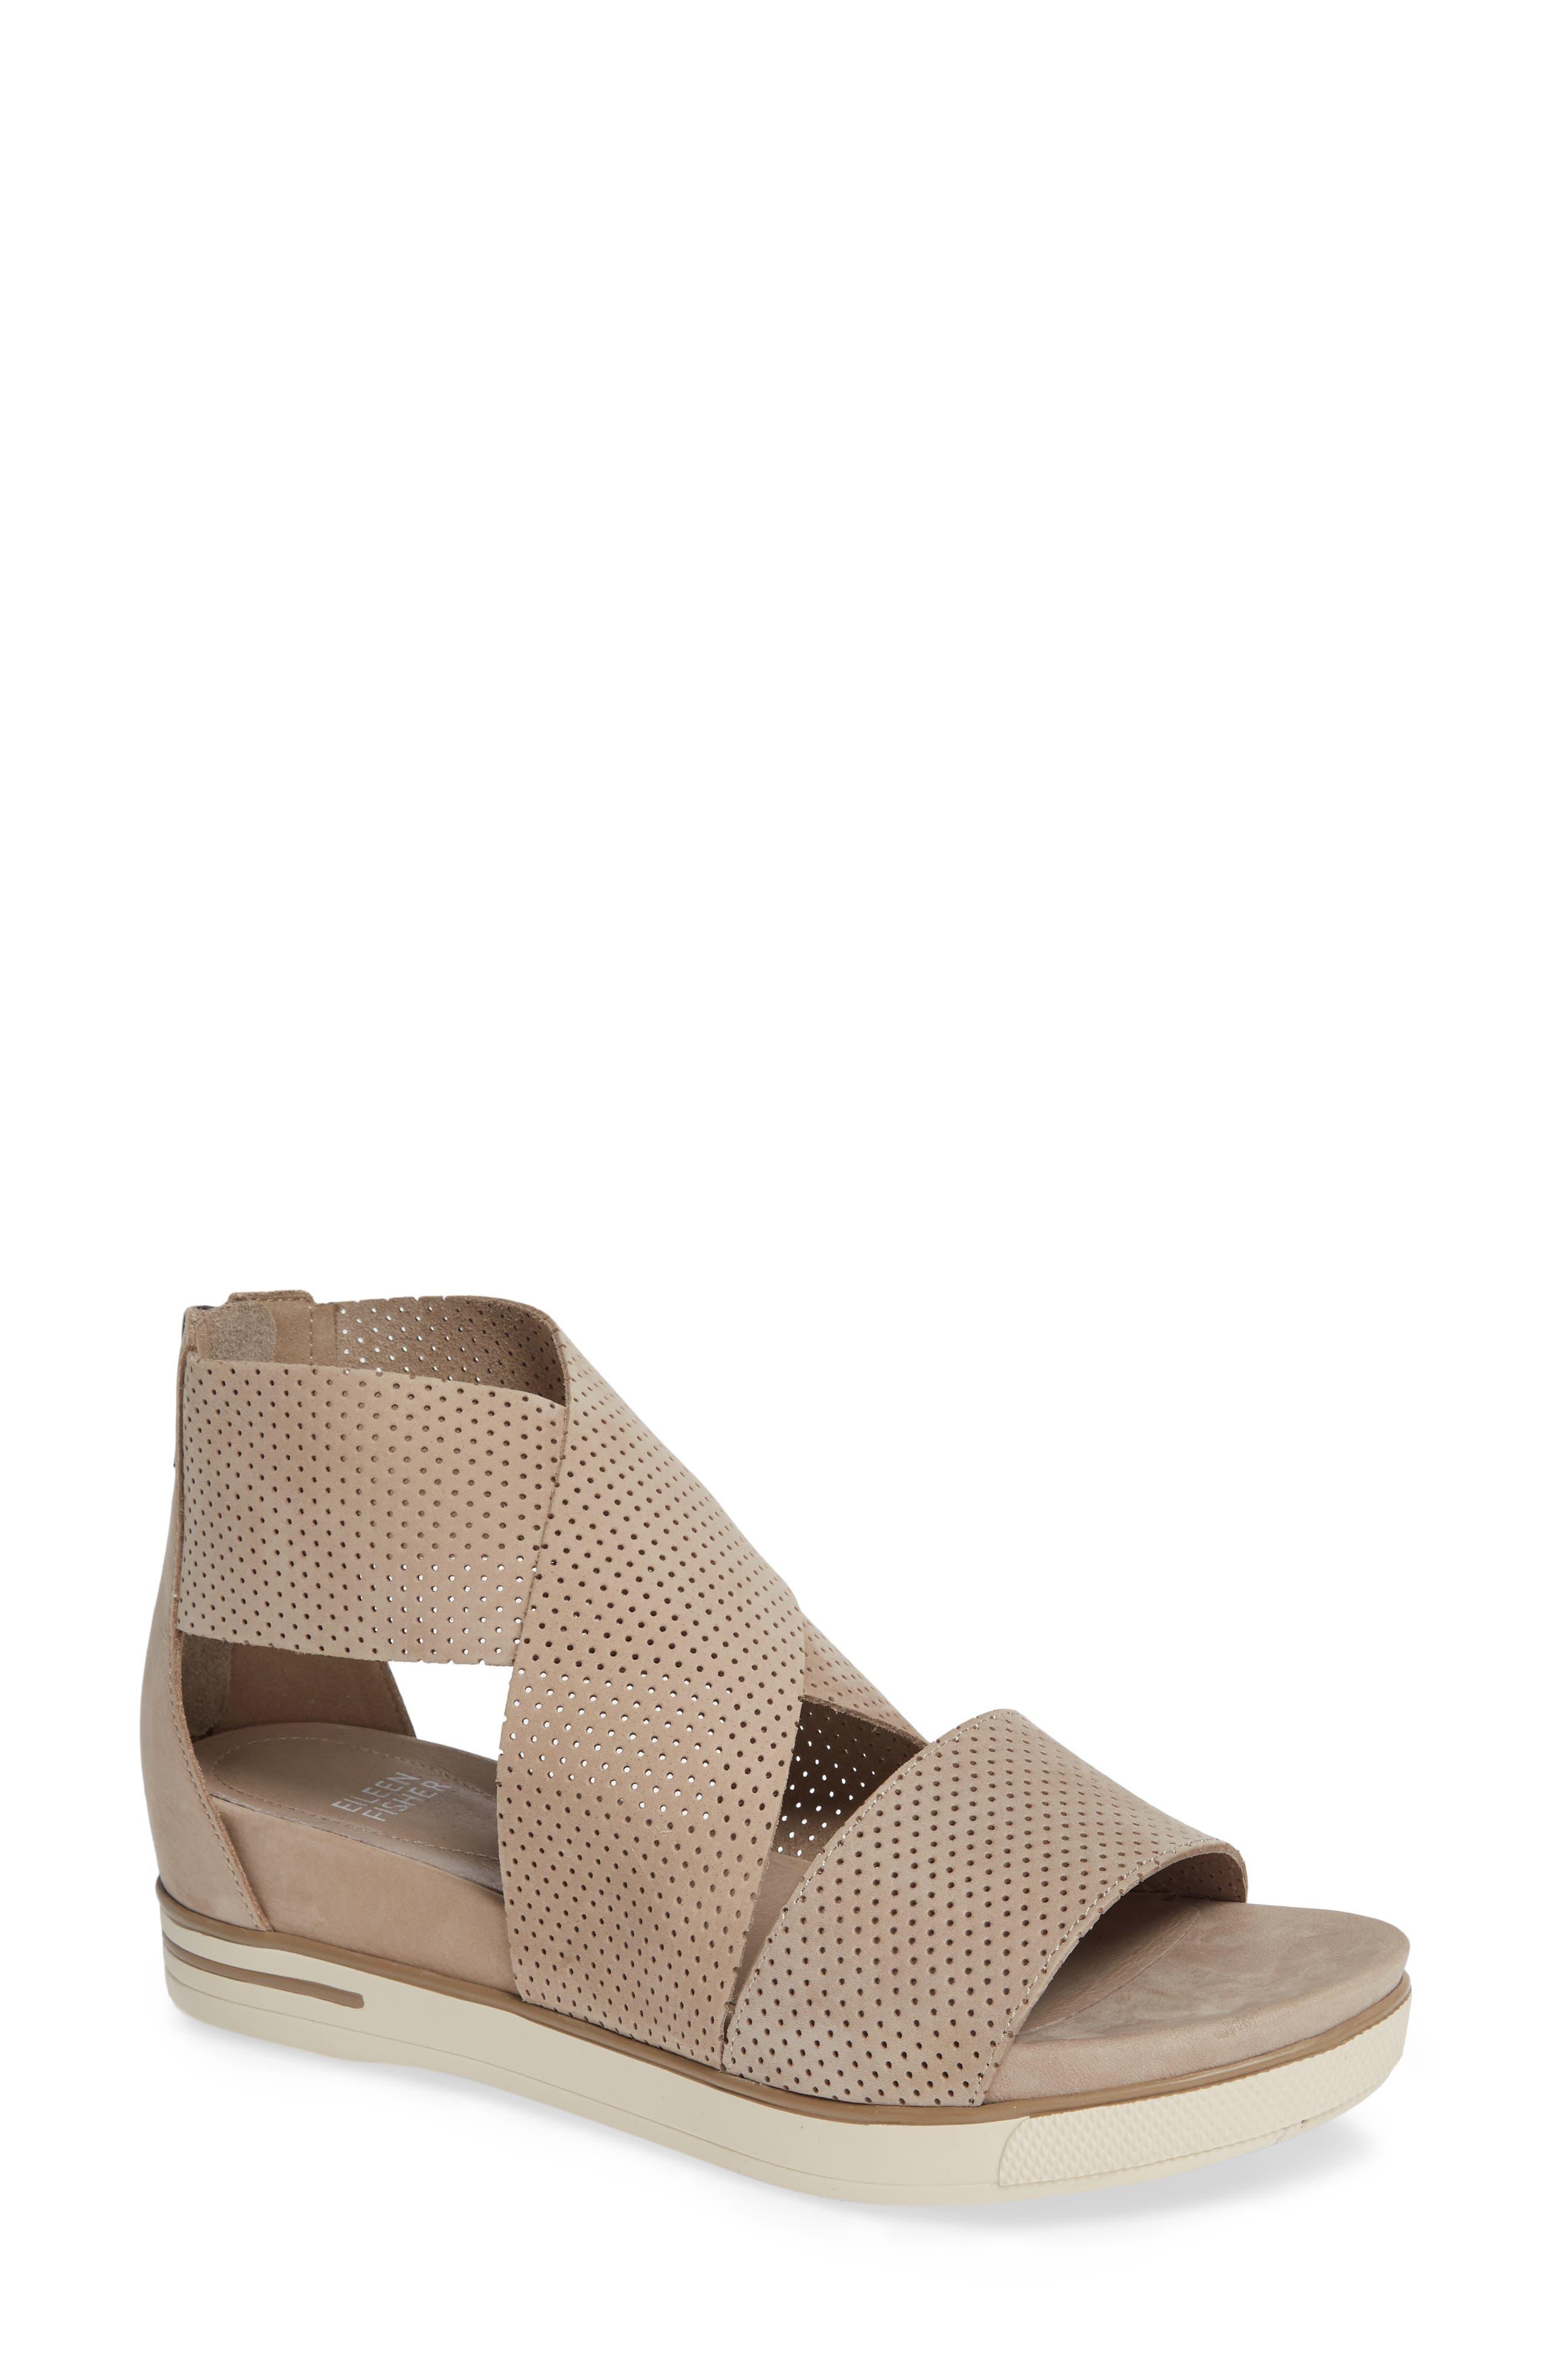 Eileen Fisher Shoes Sale \u0026 Clearance